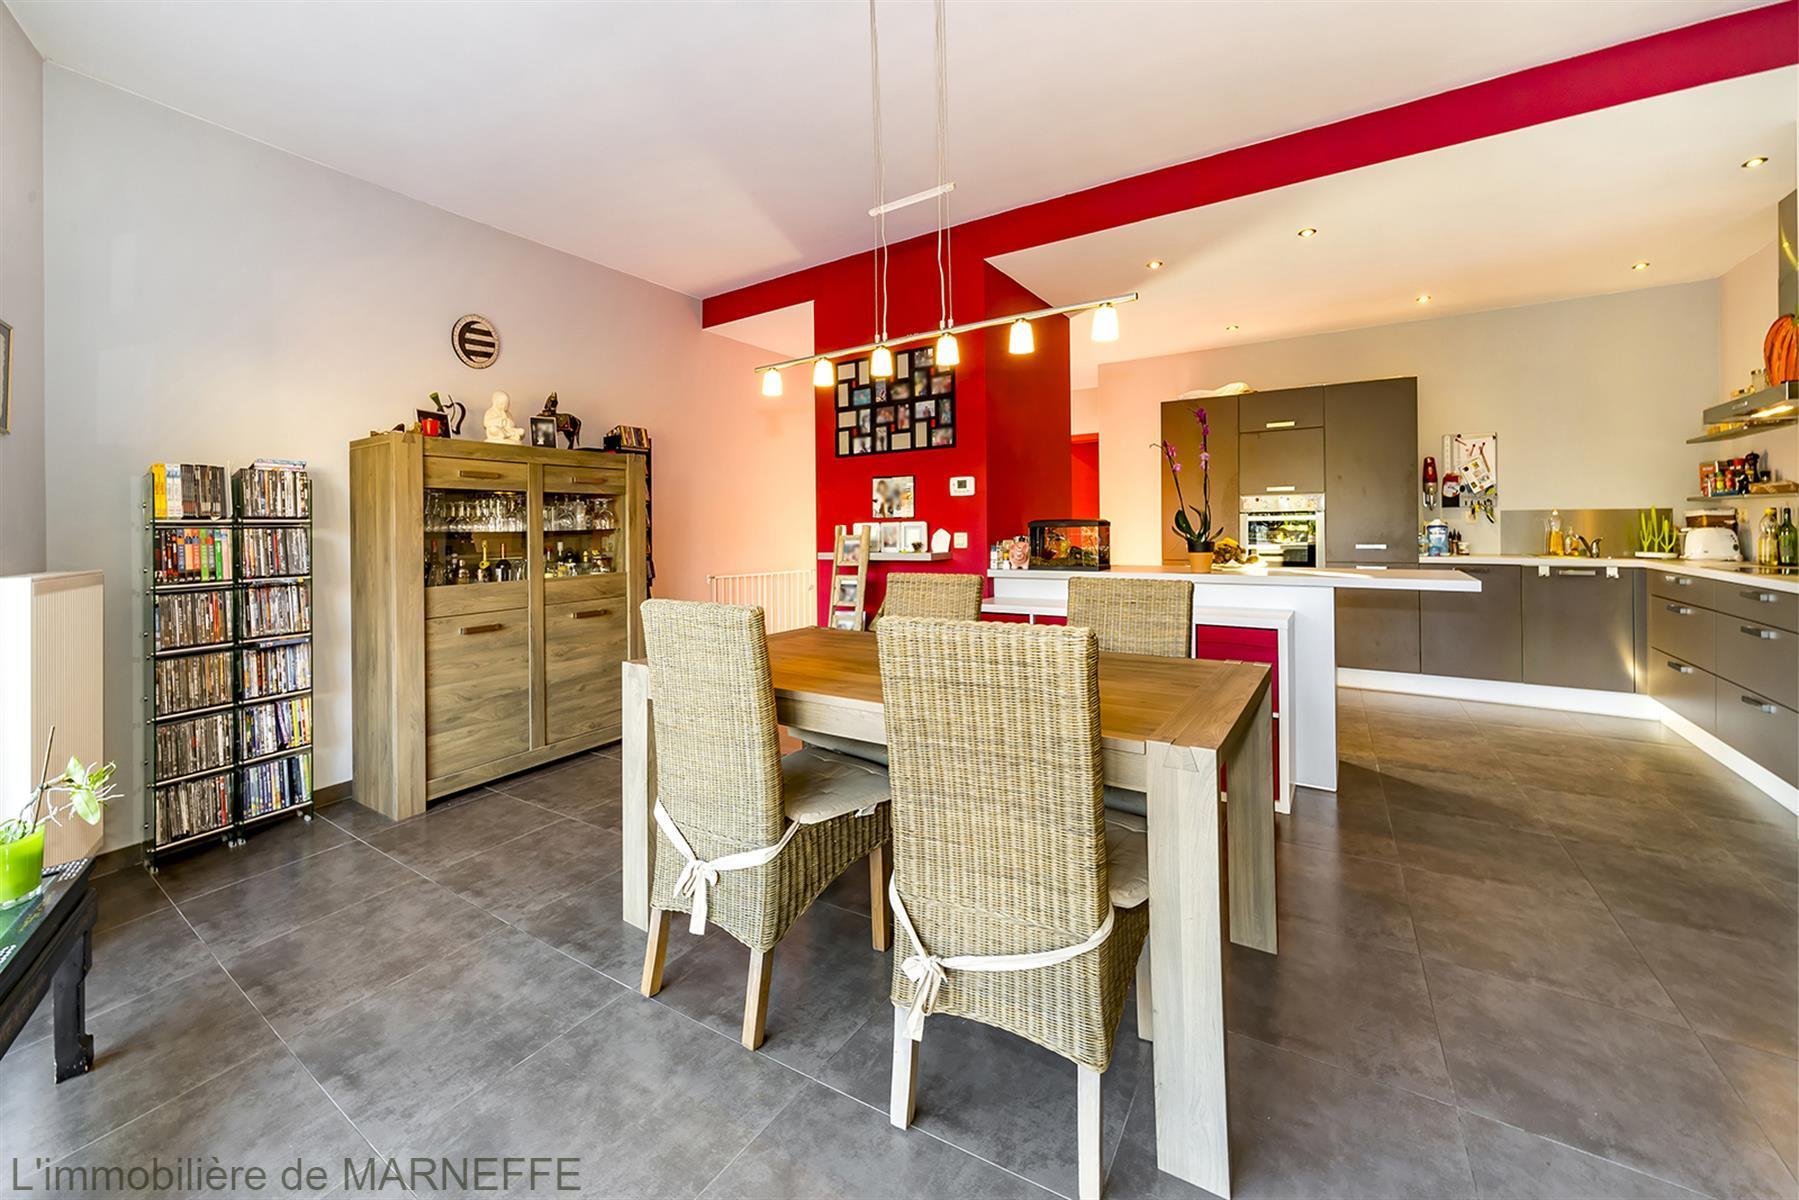 Appartement avec jardin - Orp-Jauche - #3625402-5